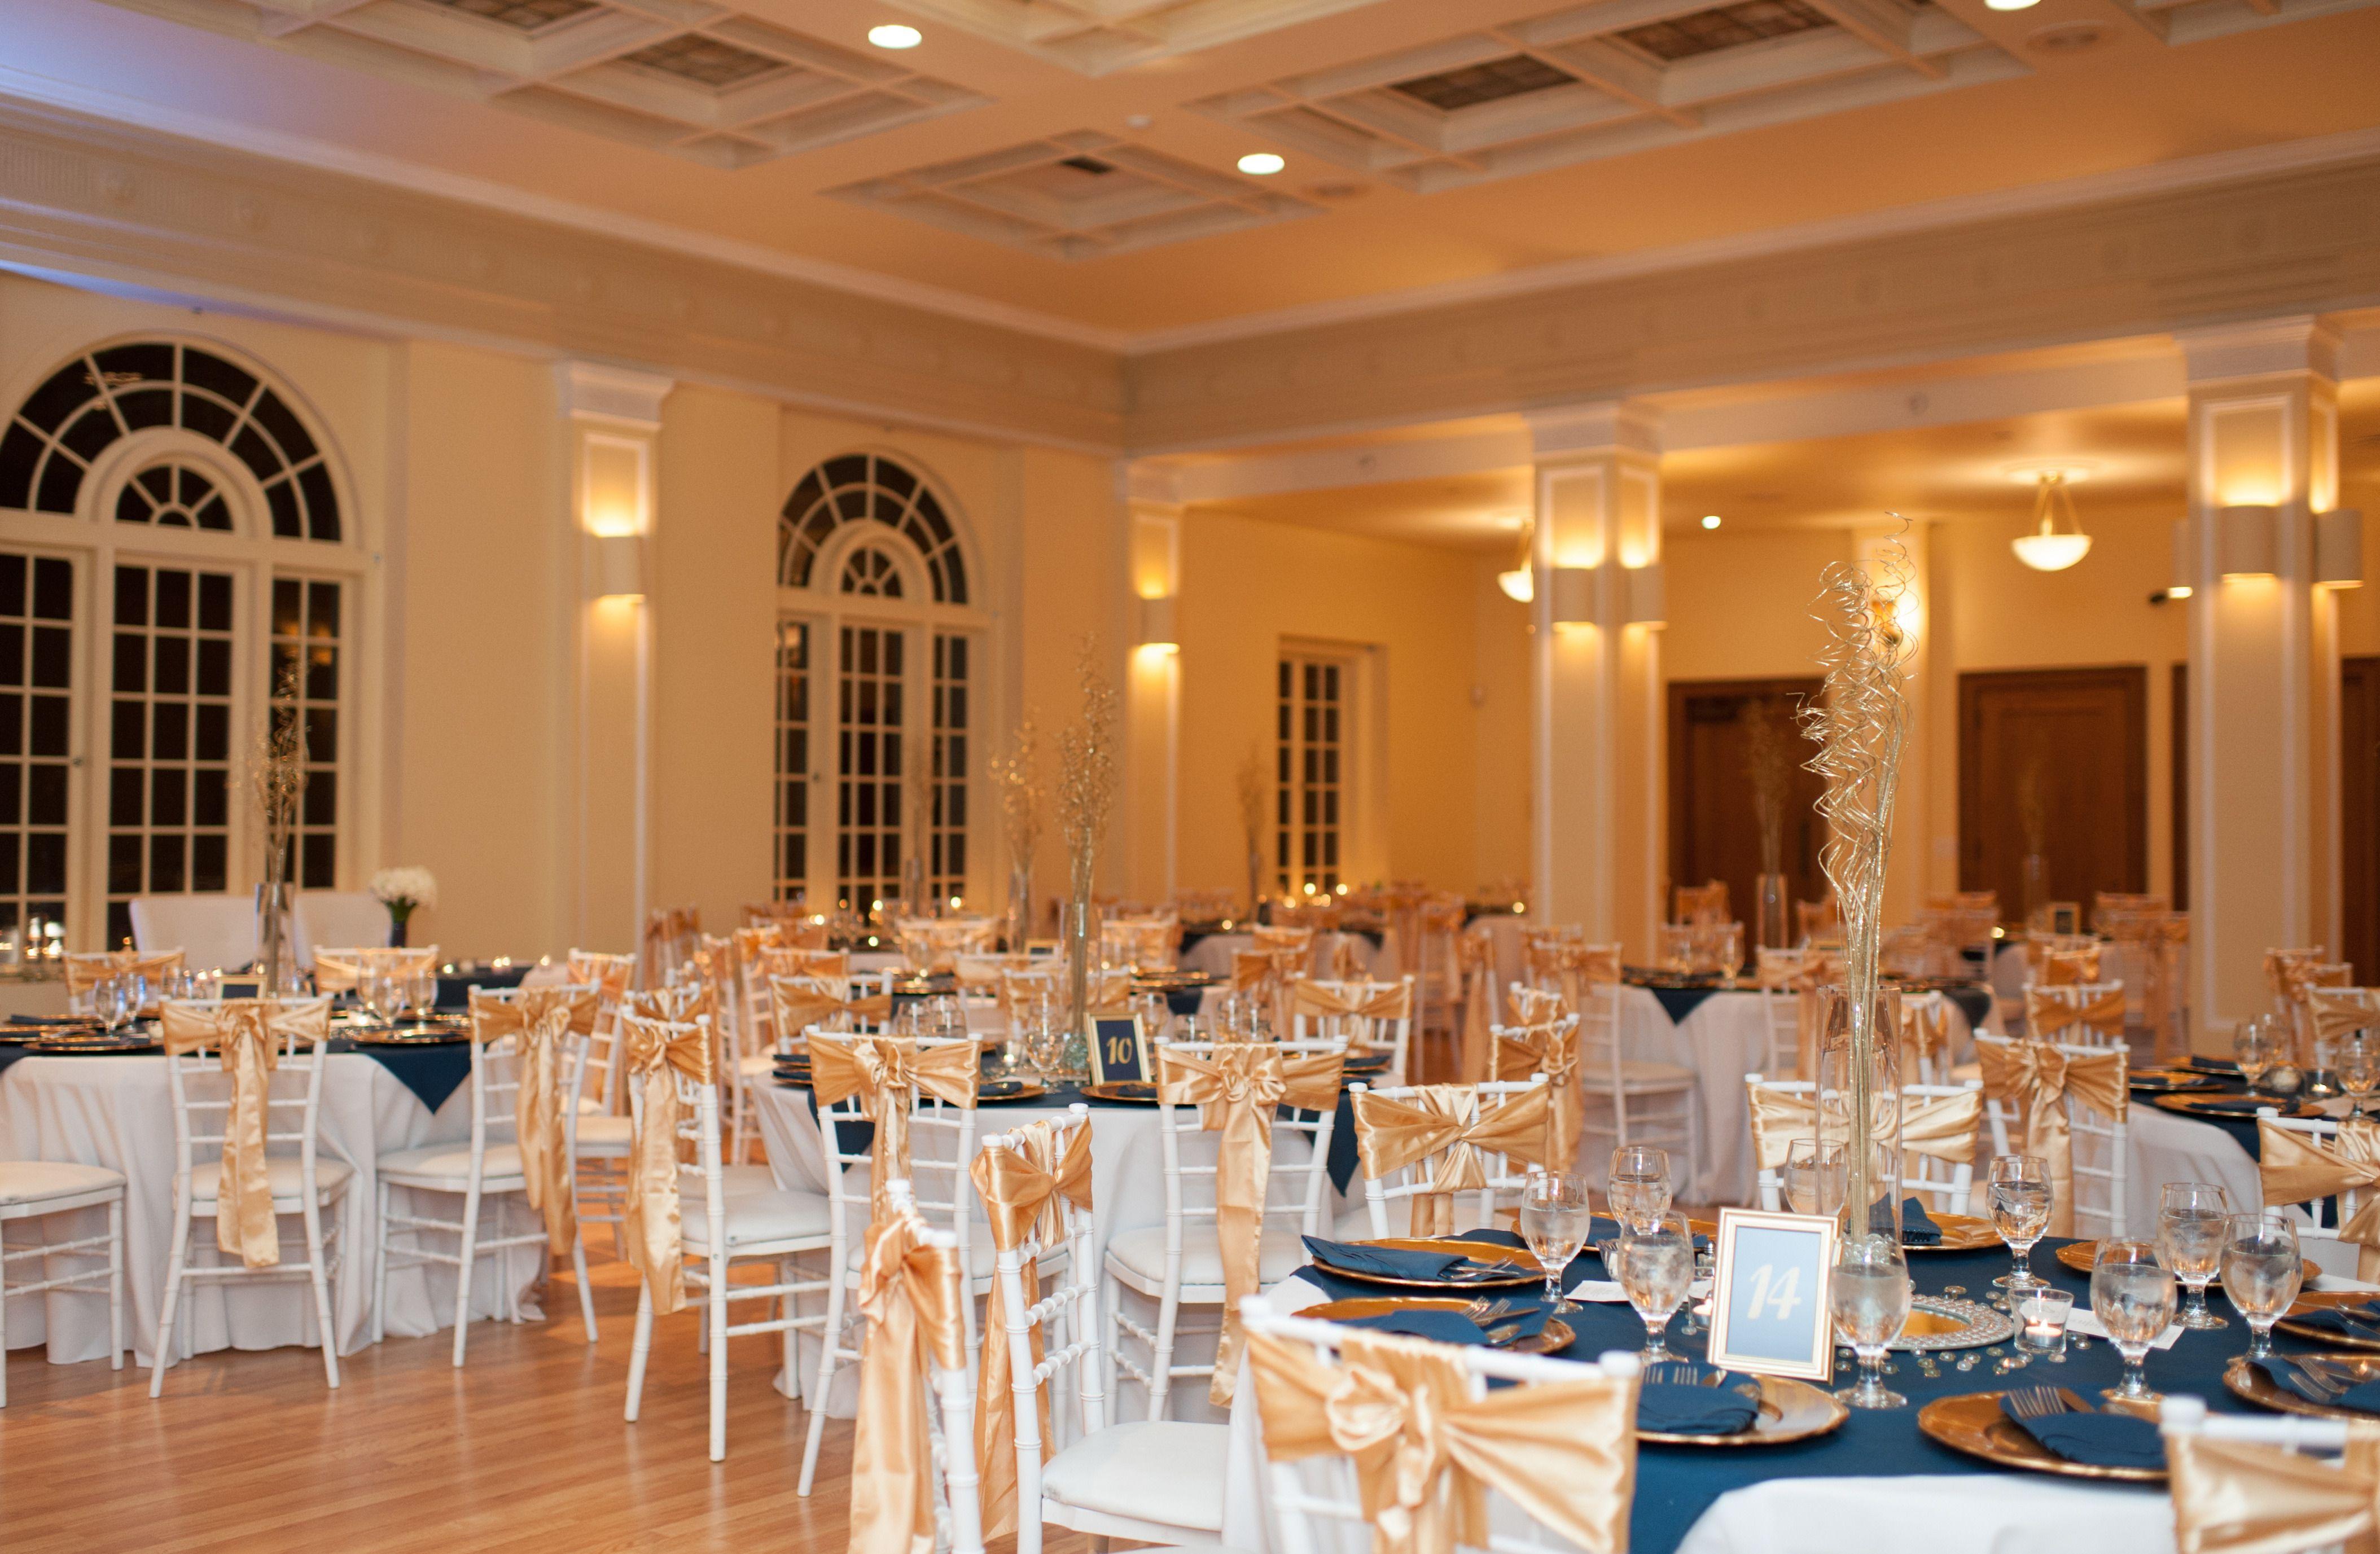 Washington winter wedding at monte cristo ballroom for Indoor wedding venues washington state